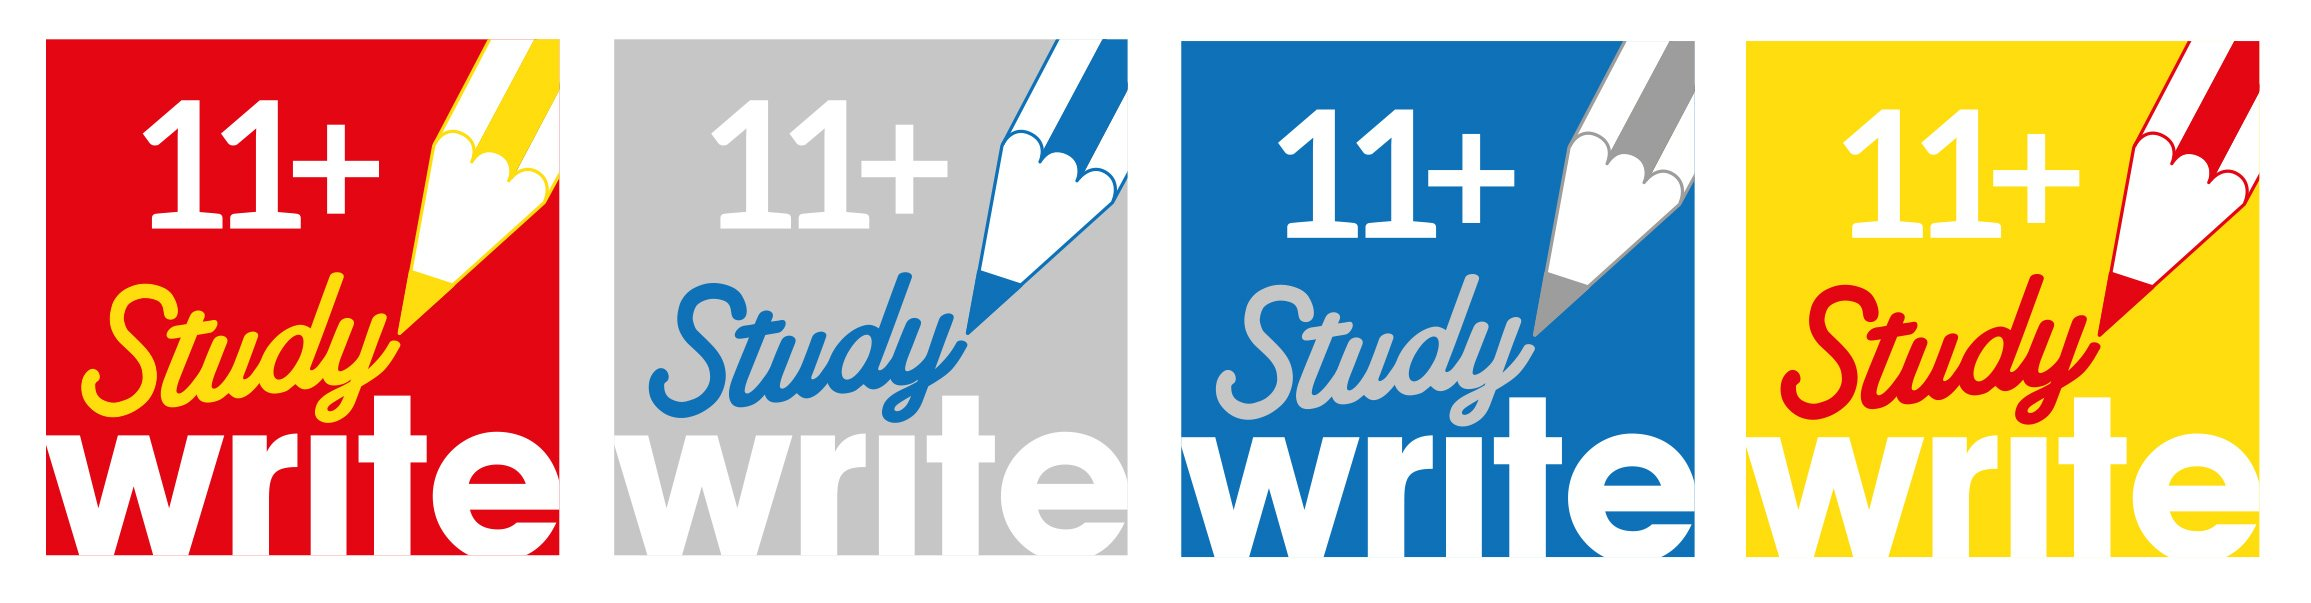 Study Write 11+